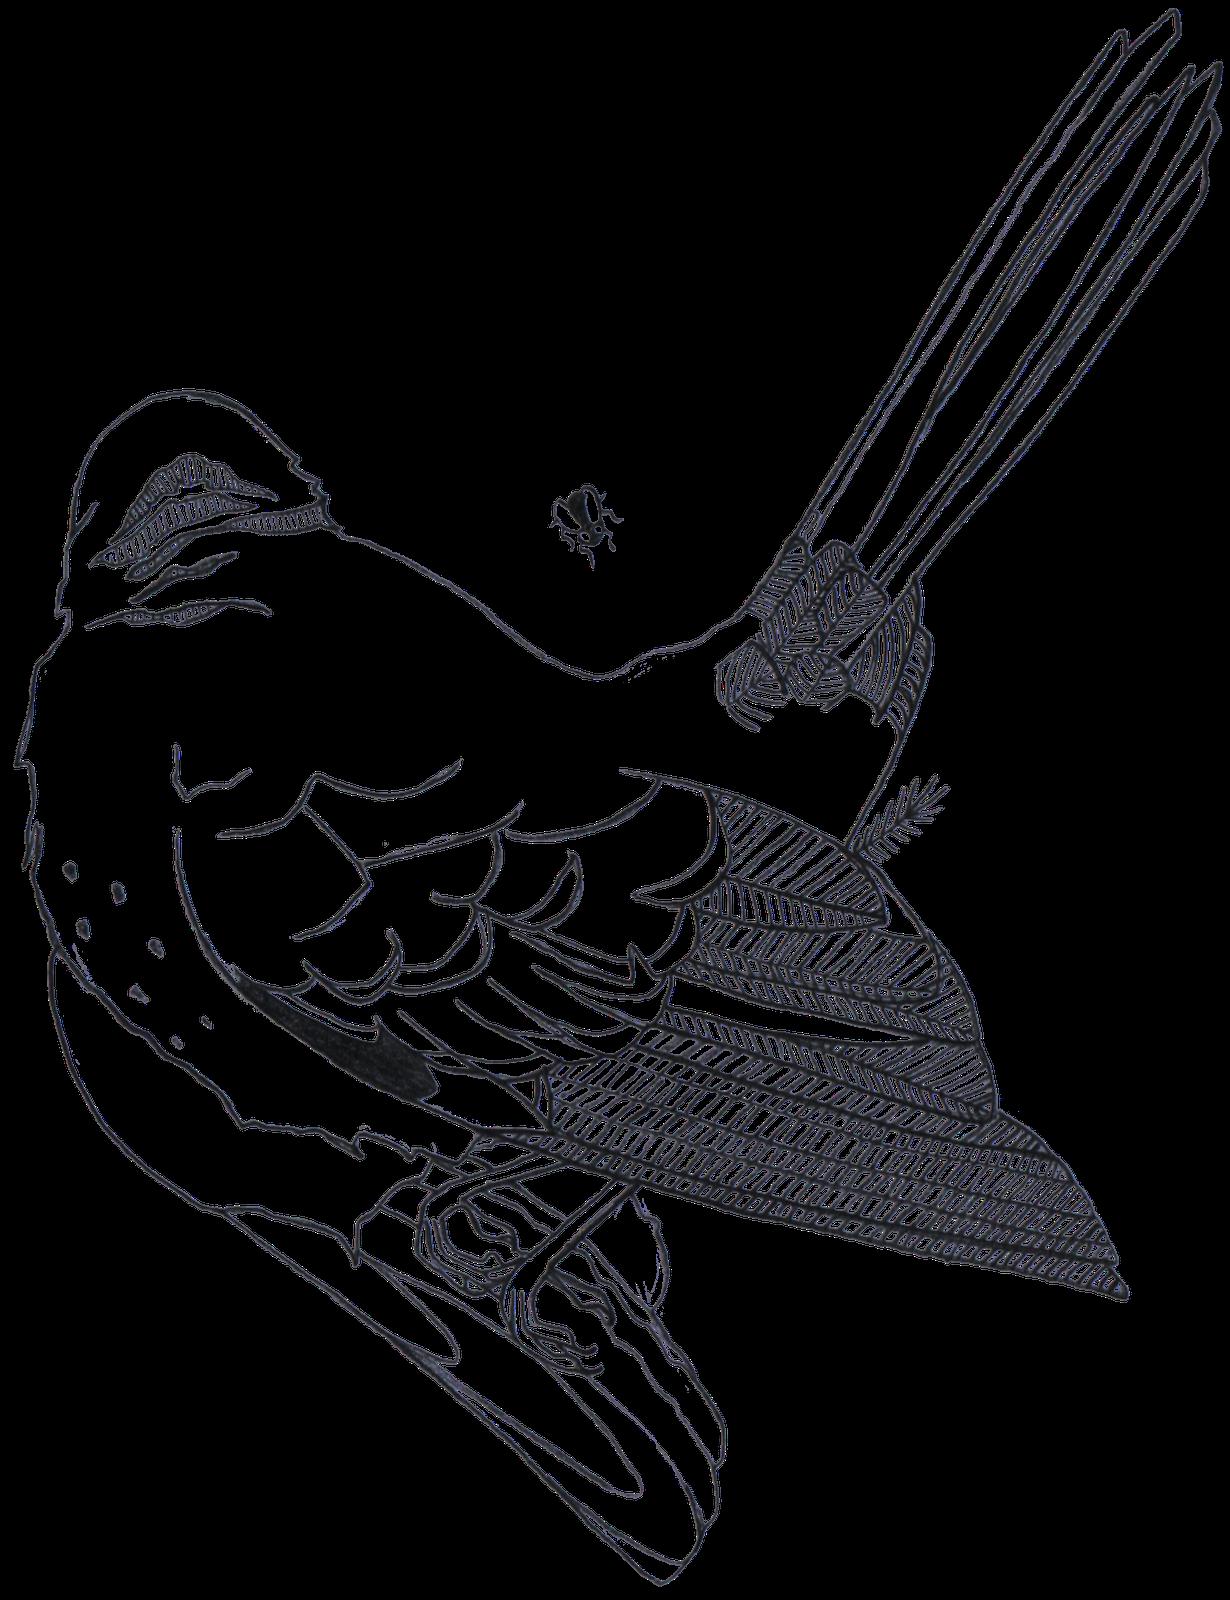 Dead bird drawing at. Quail clipart sketch